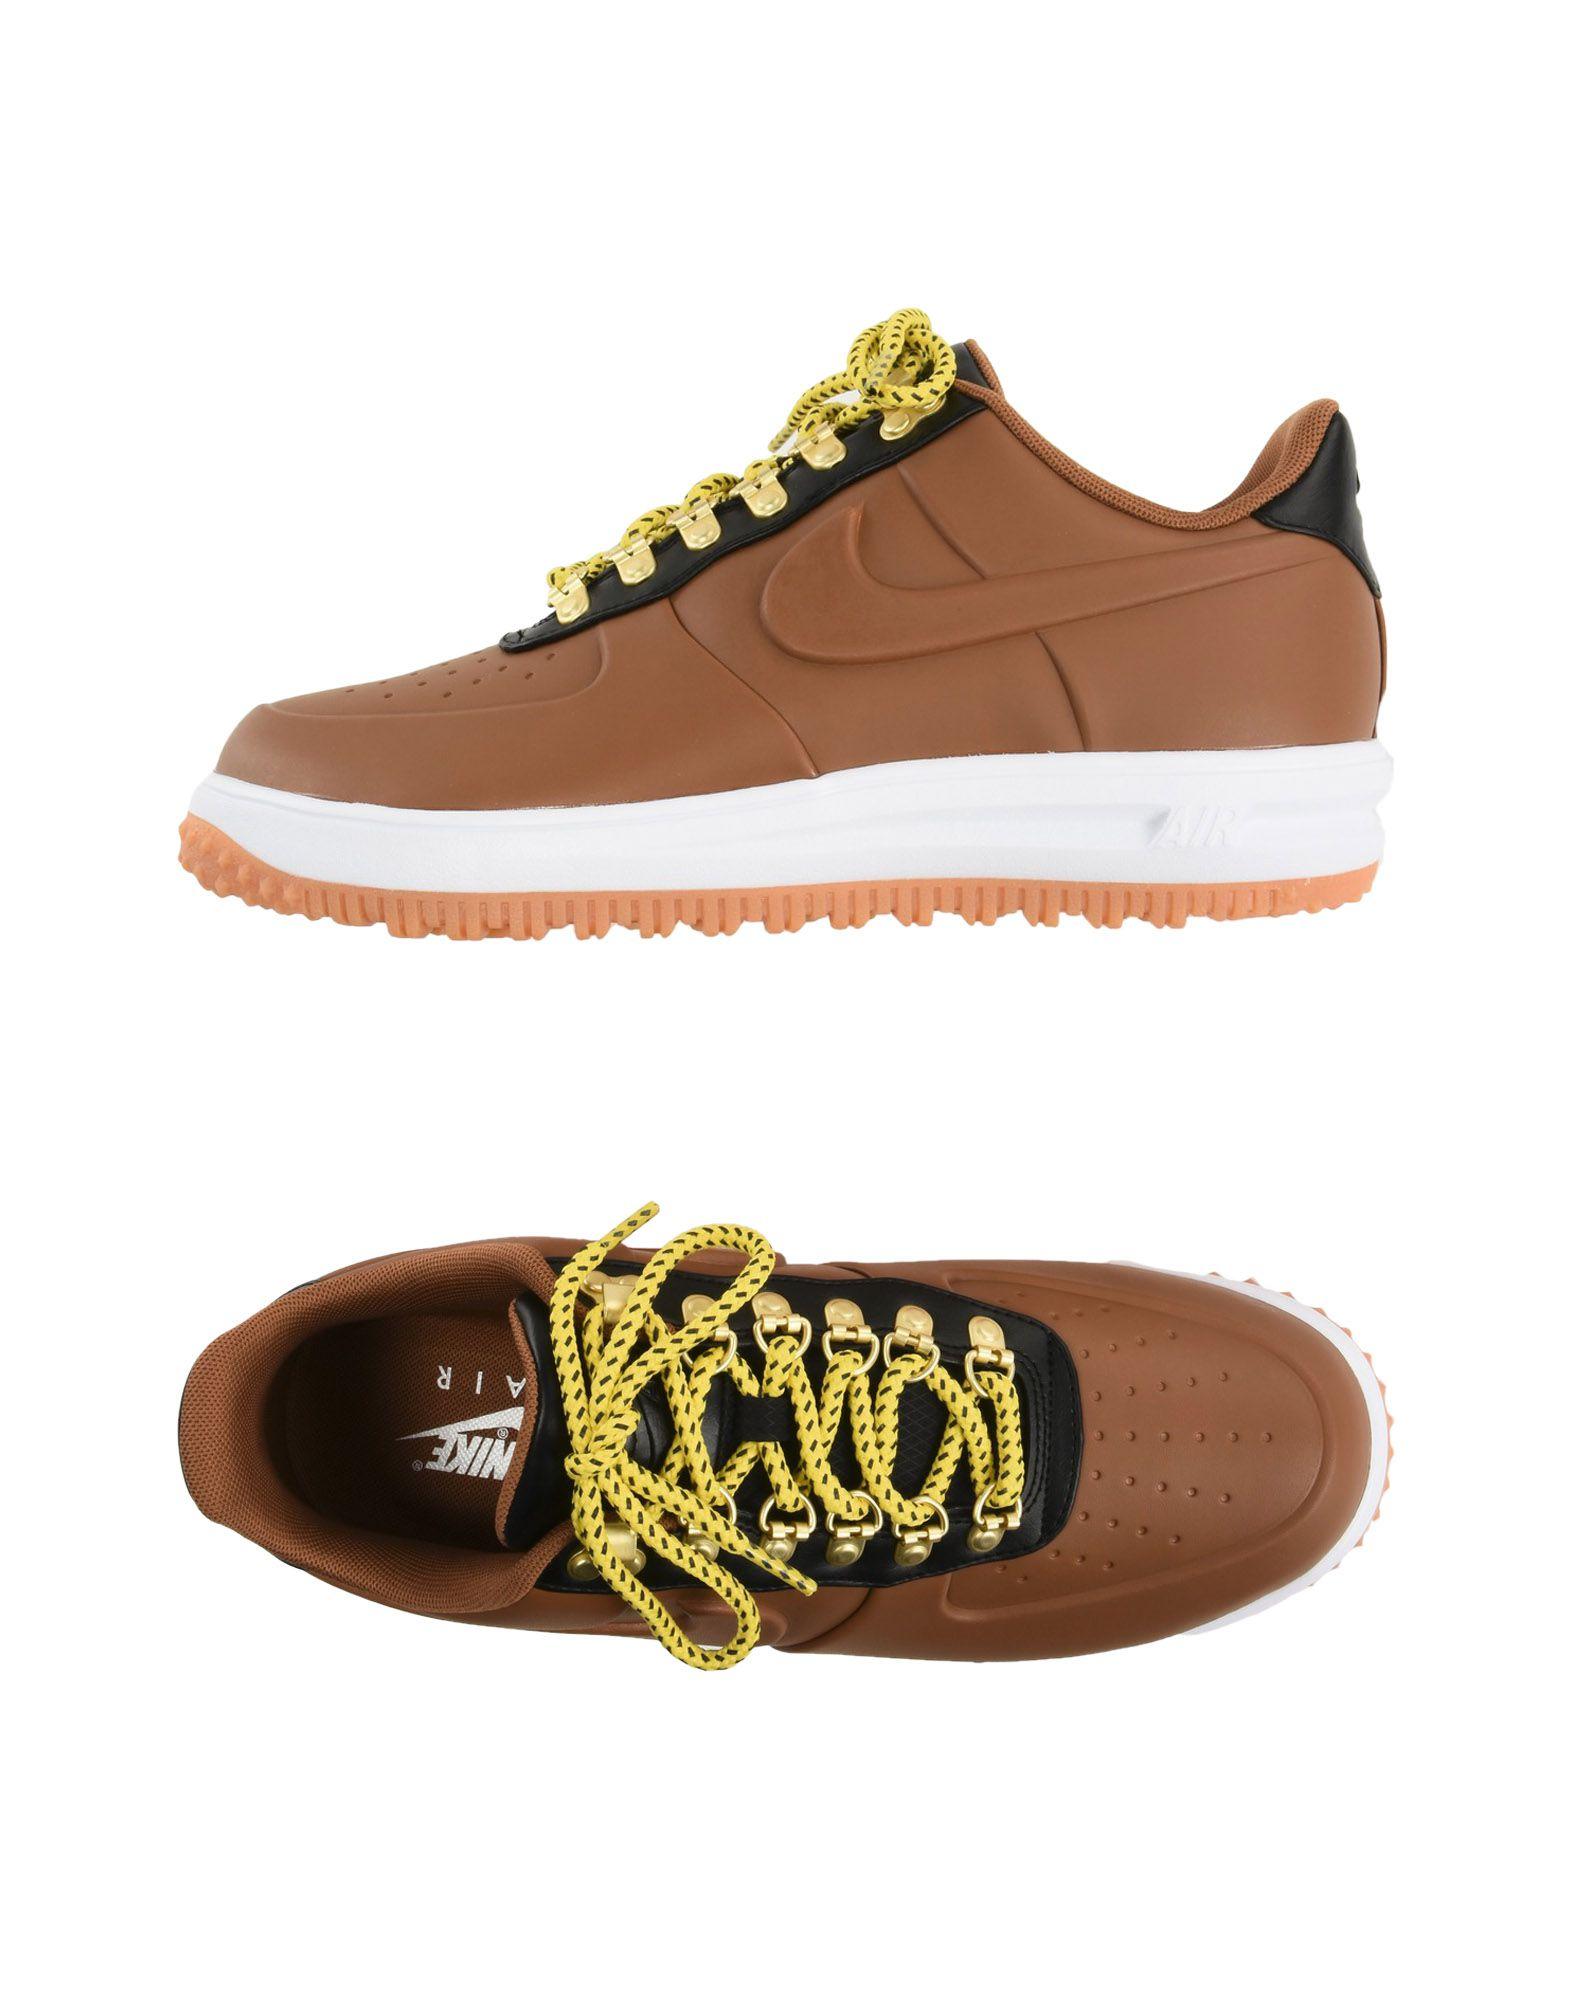 Scarpe da Ginnastica Nike - Lf1 Duckboot Low - Uomo - Nike 11413753HB 9c8353